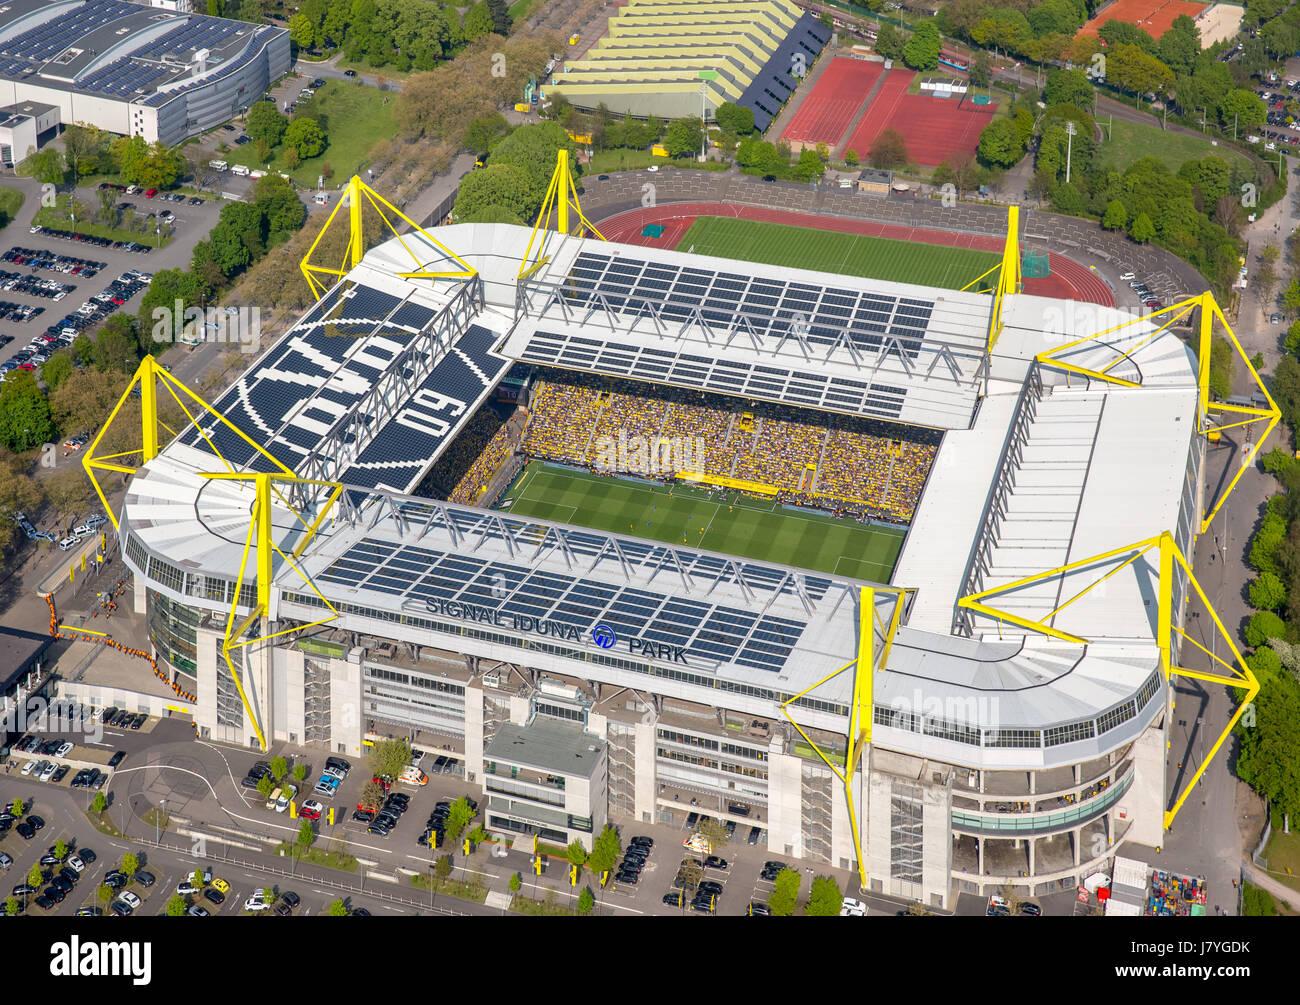 dortmund bvb stadion